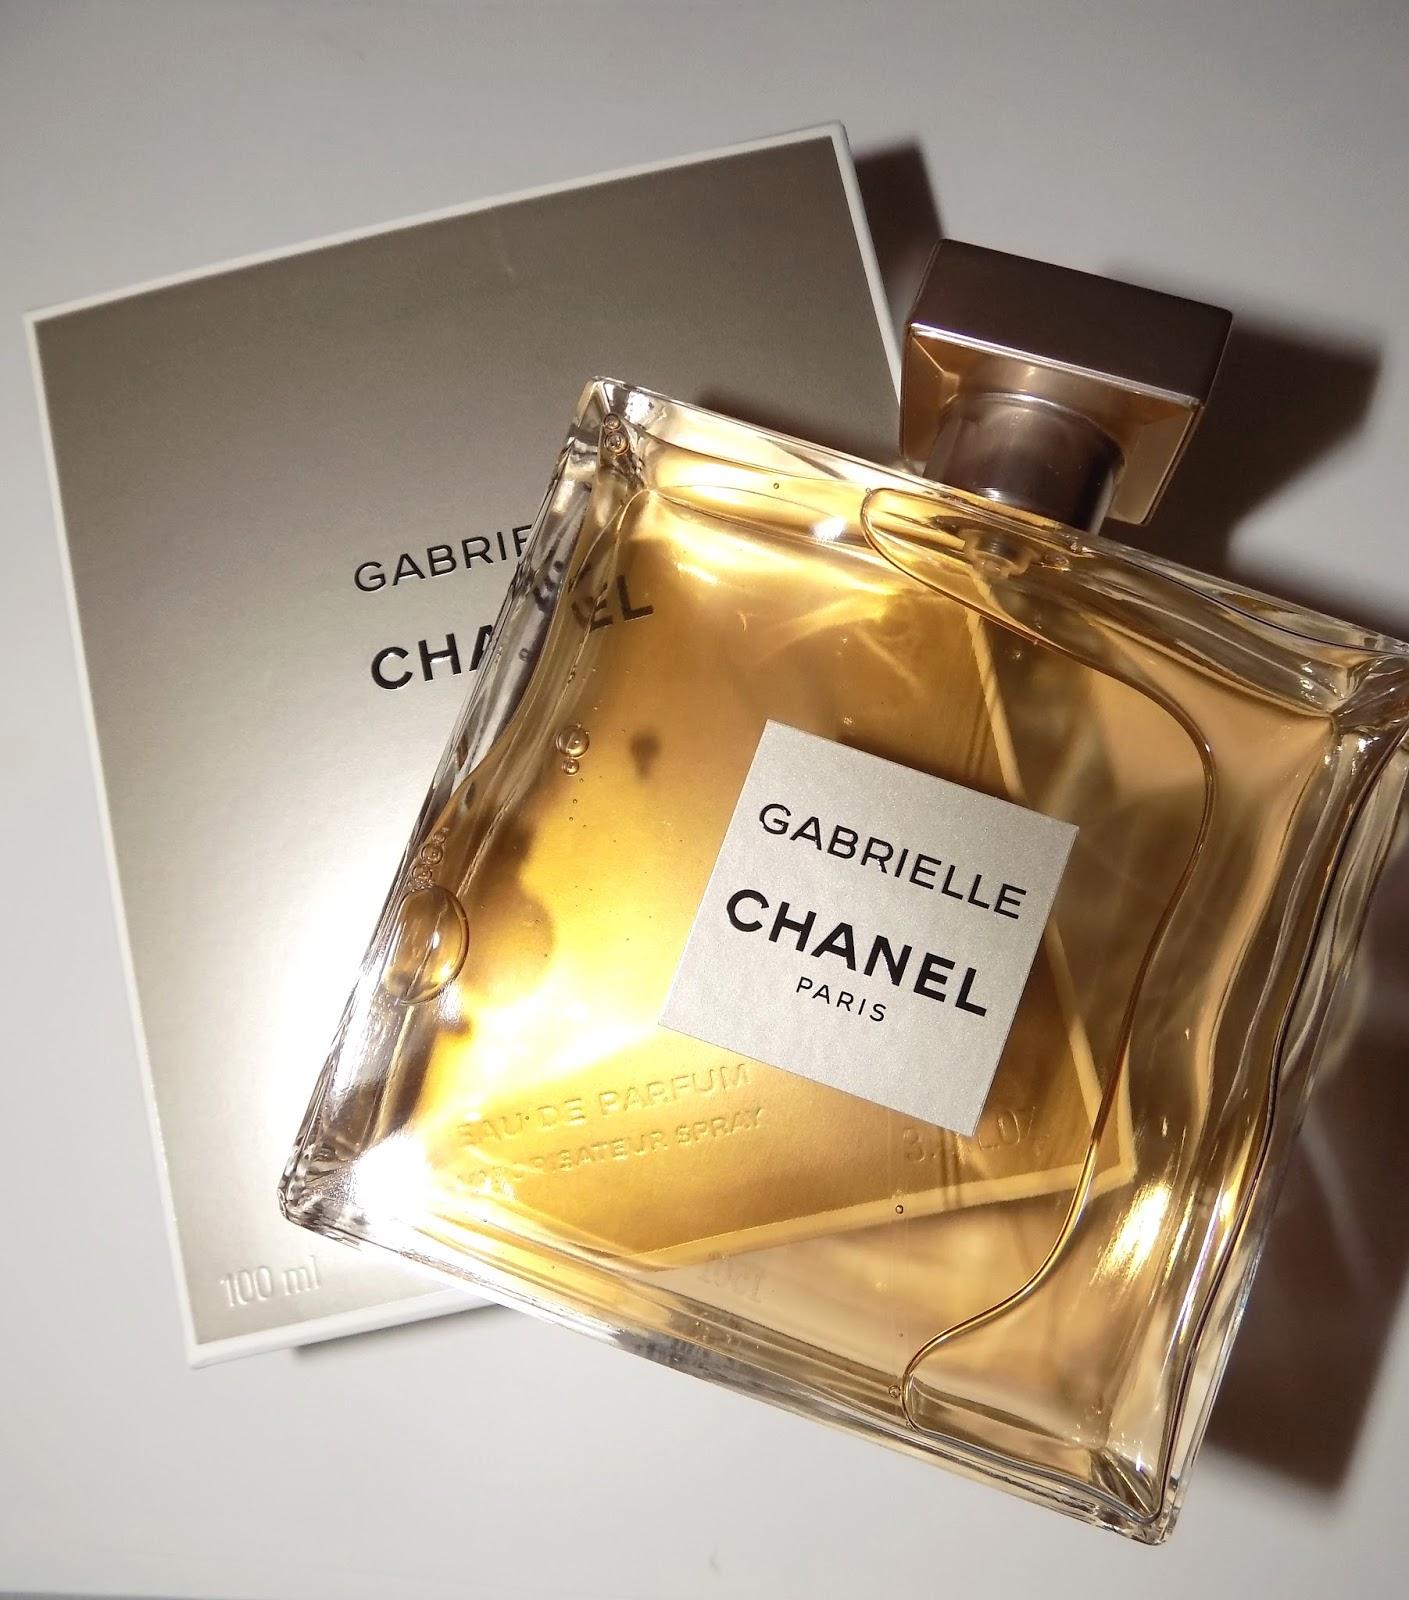 chanel gabrielle perfume. gabrielle chanel - the fragrance perfume